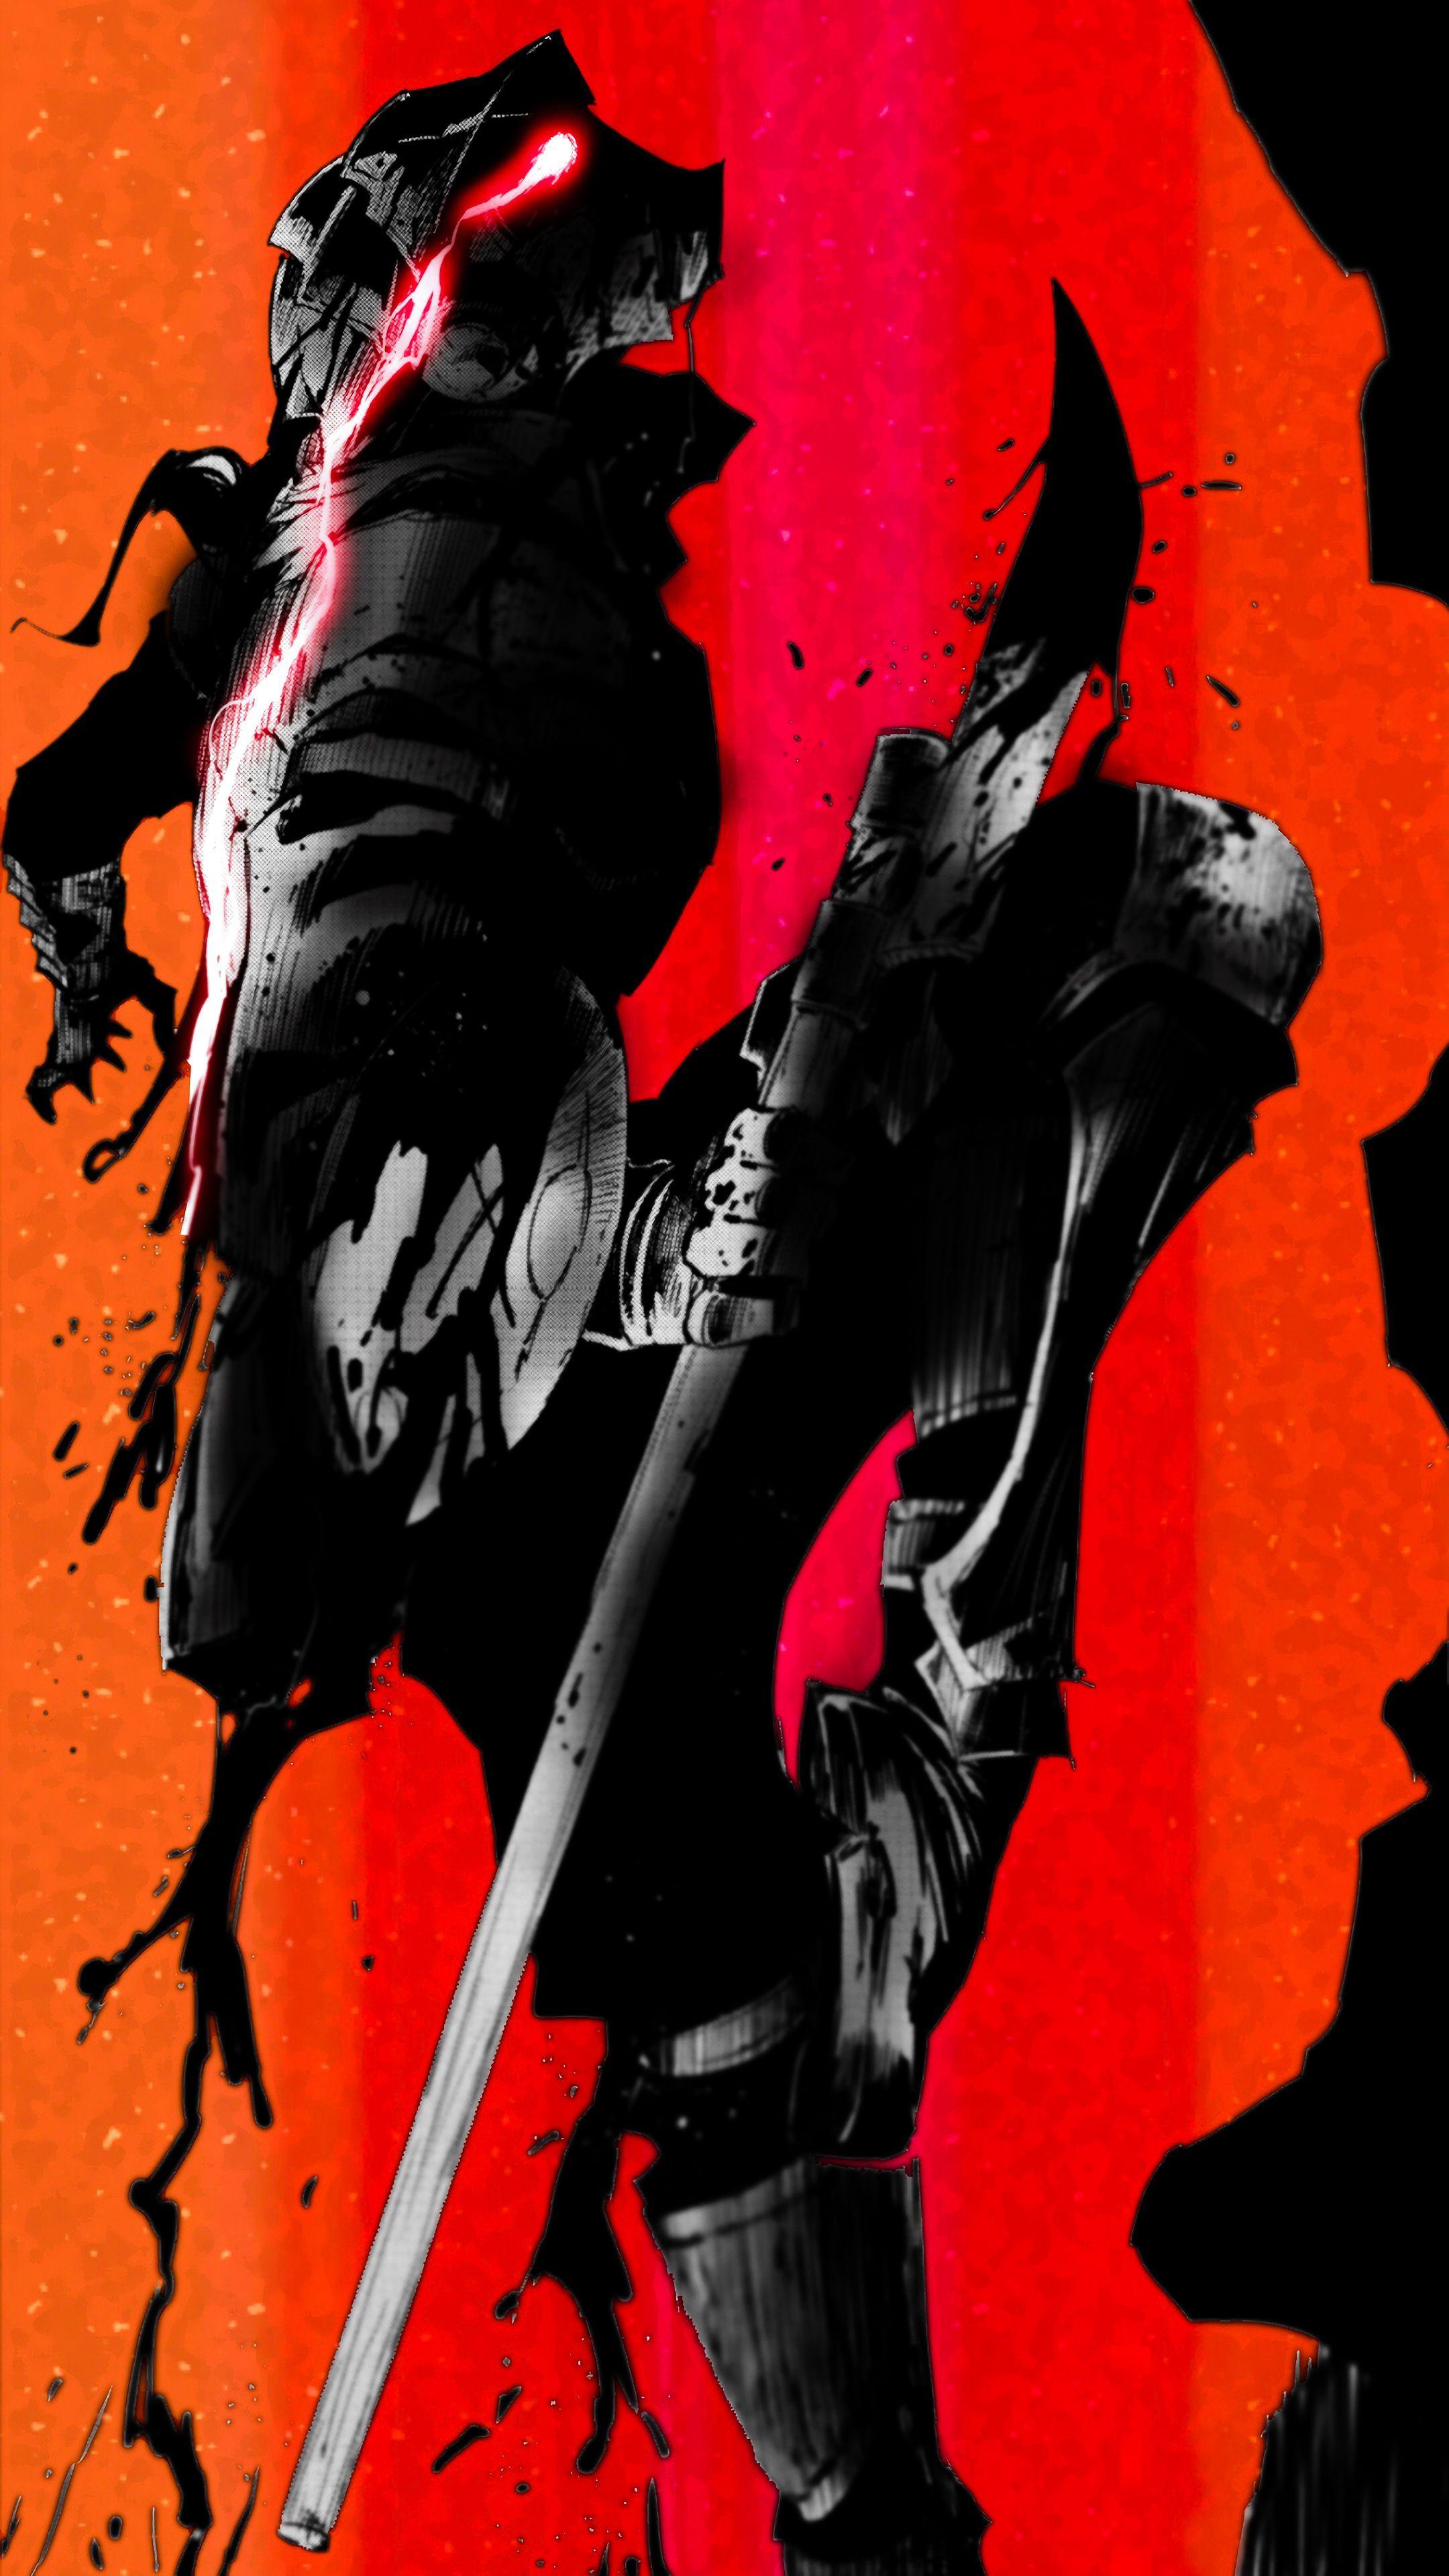 Goblin Slayer GG / in 2020 Slayer anime, Goblin, Slayer